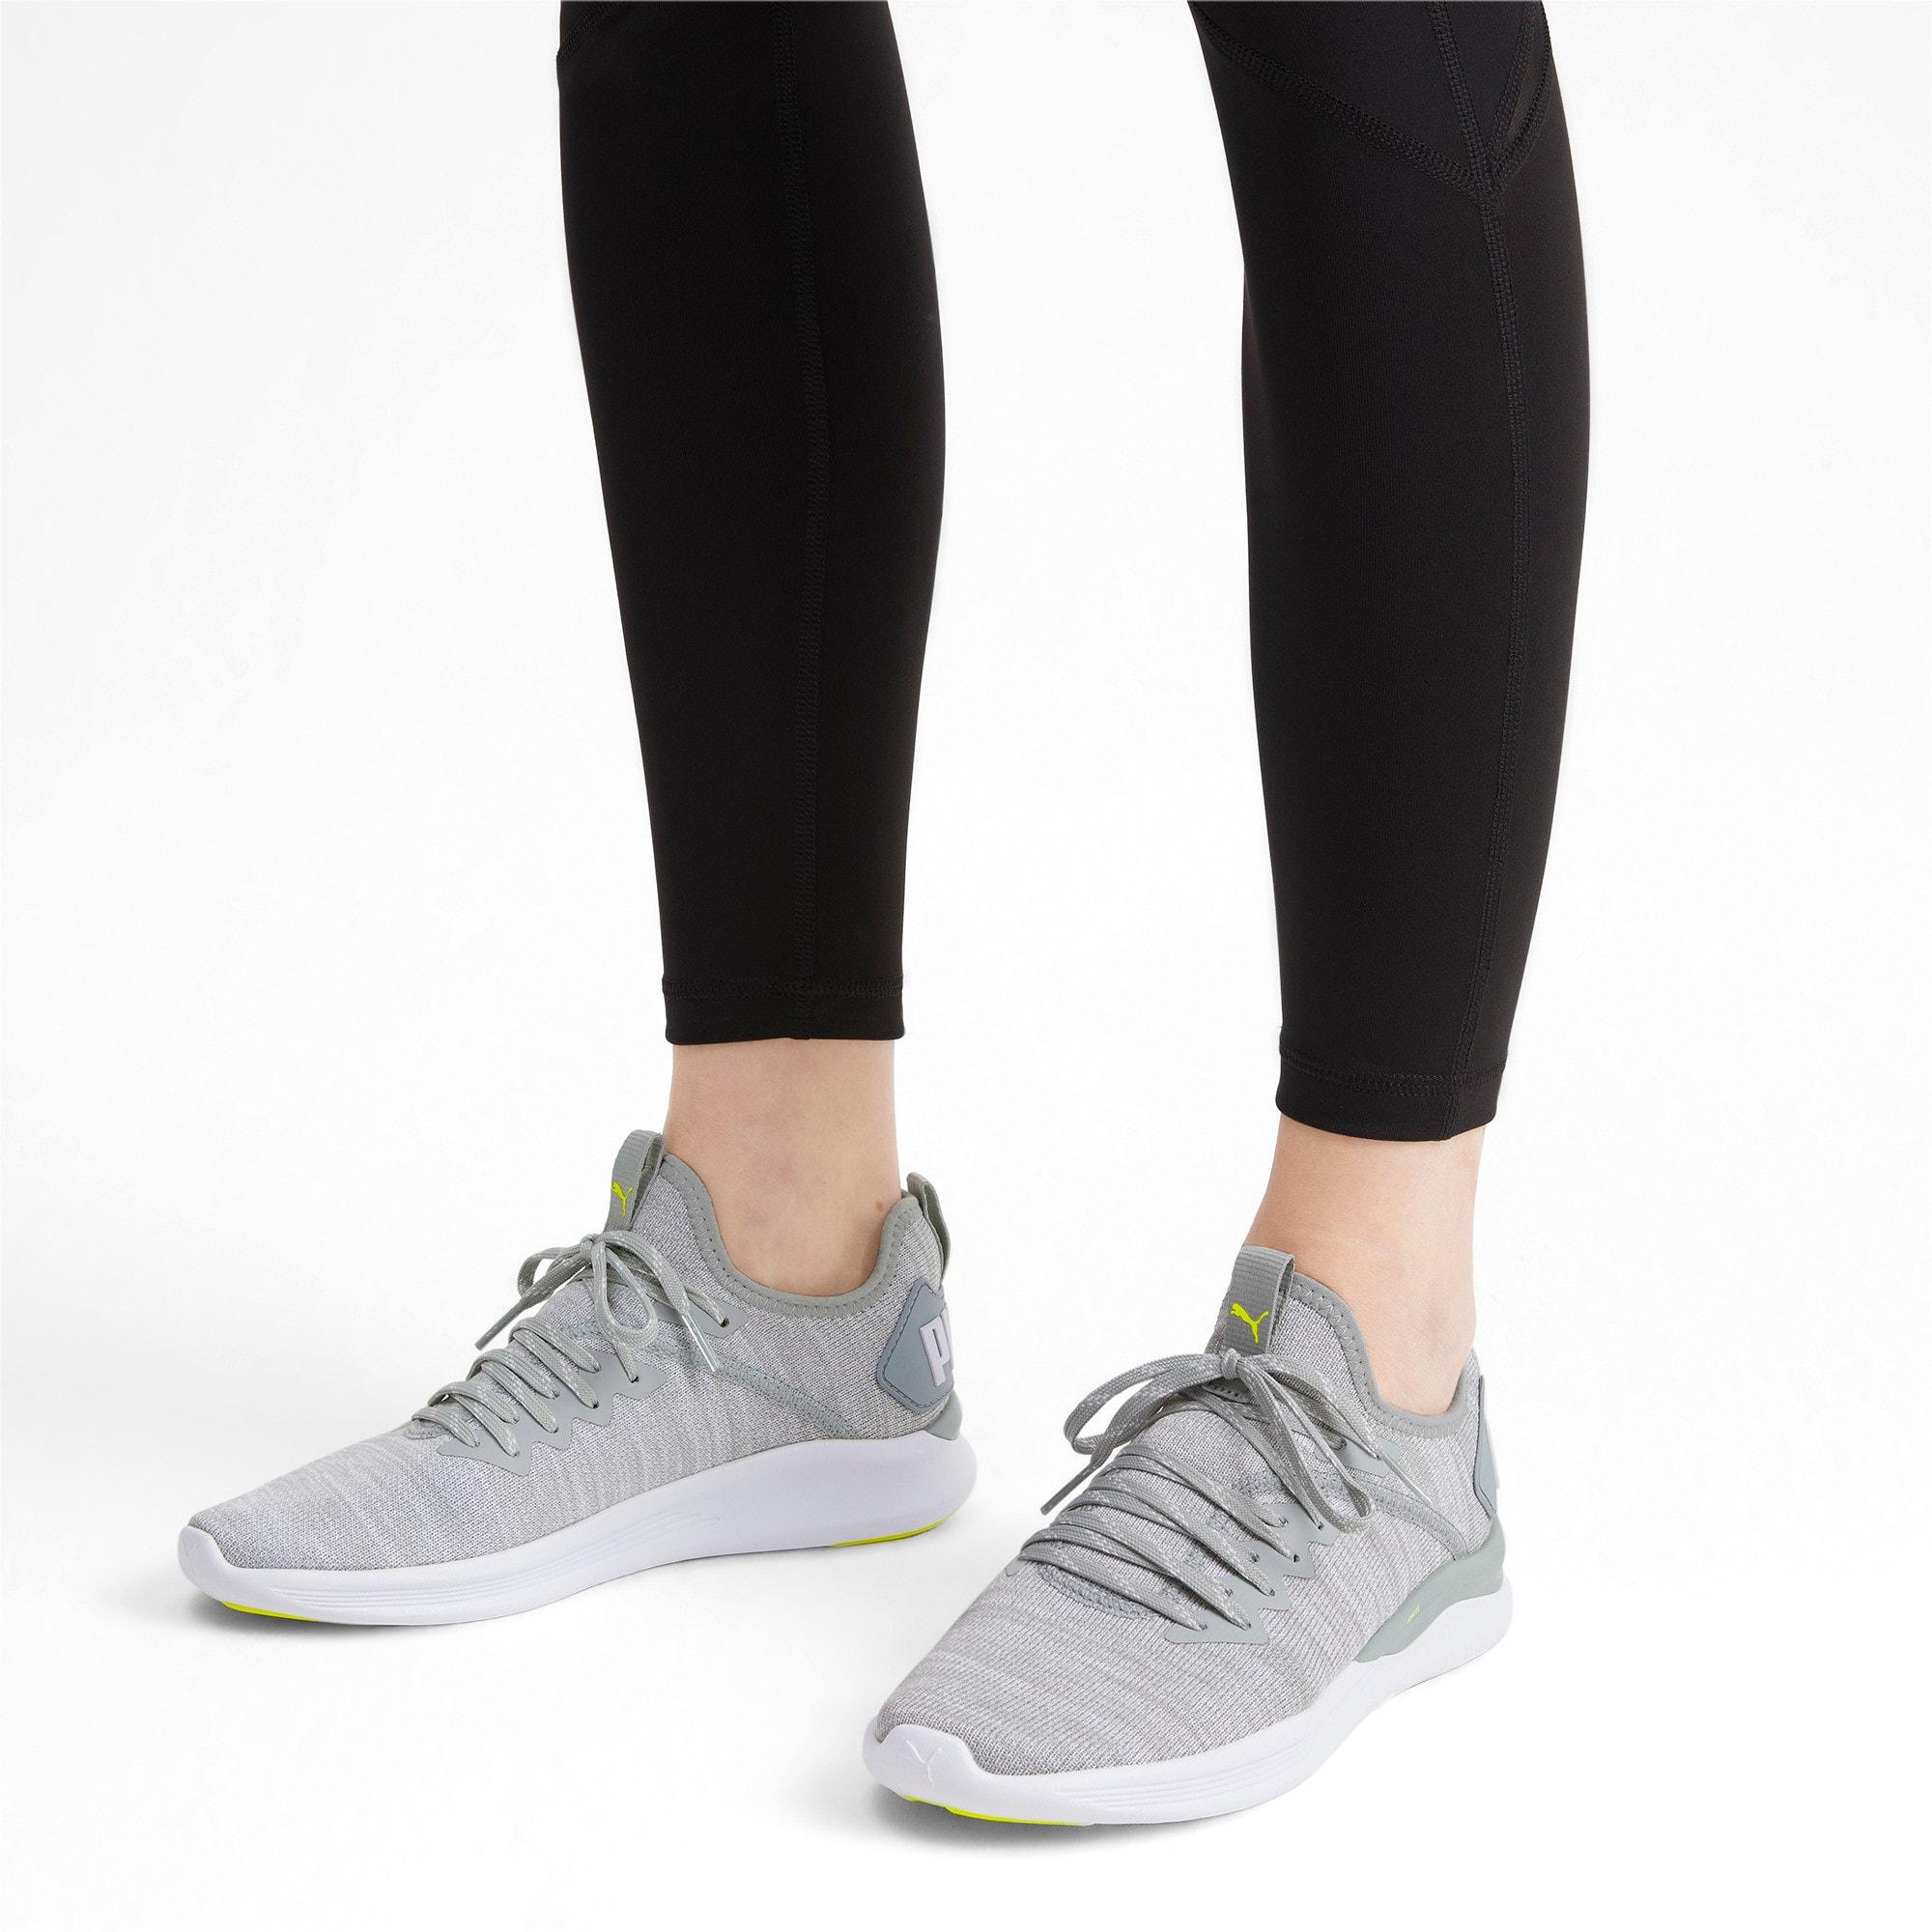 Thumbnail 2 of IGNITE Flash evoKNIT Women's Running Shoes, Quarry-White-Milky Blue, medium